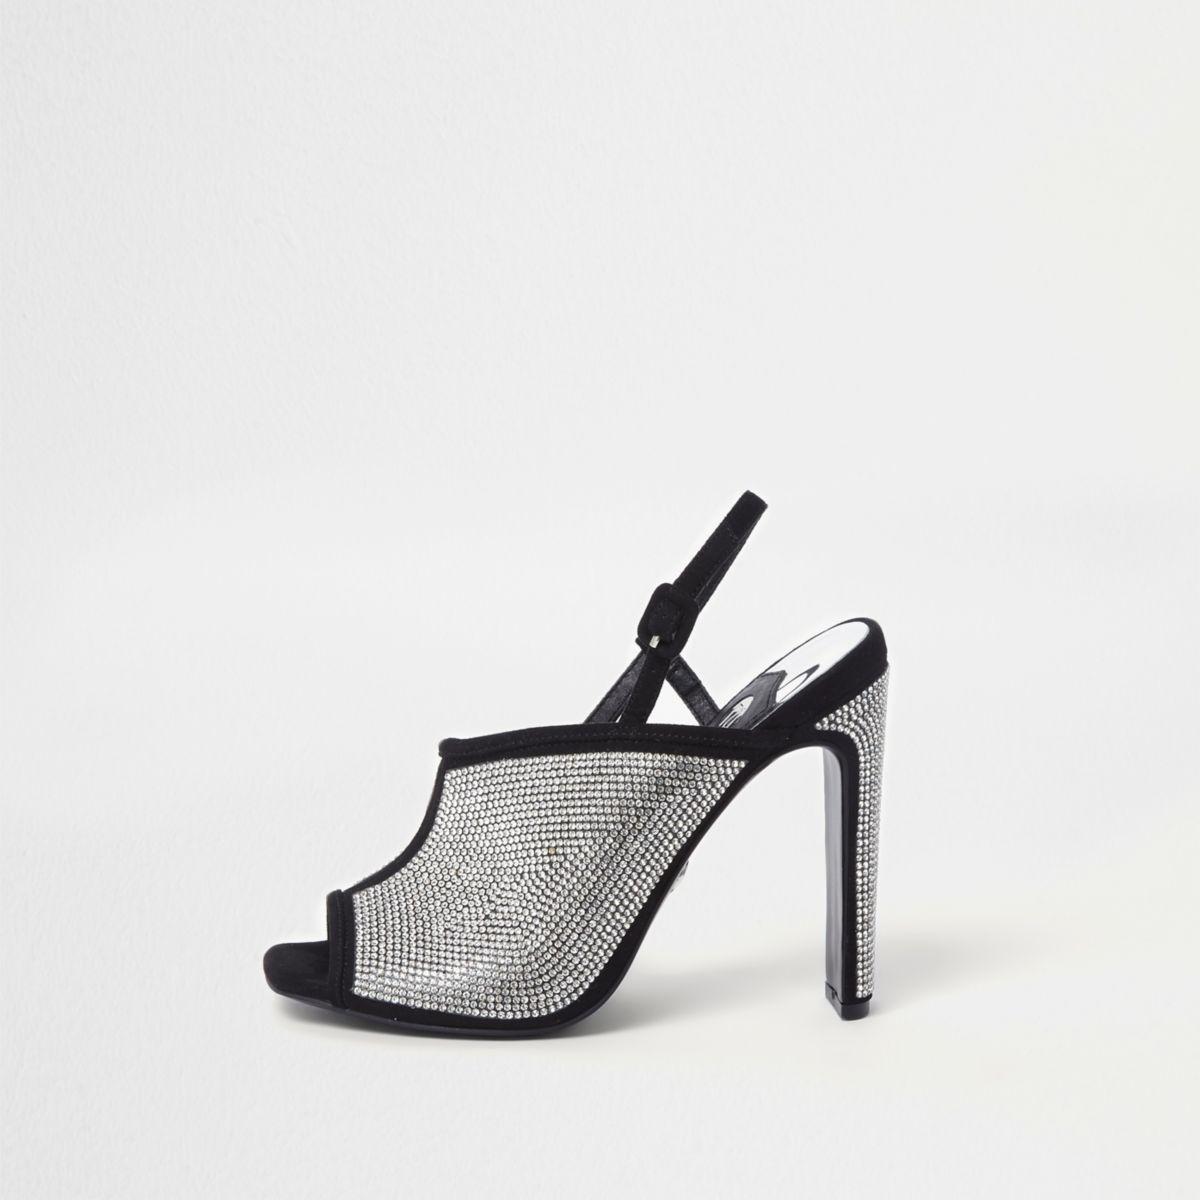 Black diamante heatseal slim heel sandals